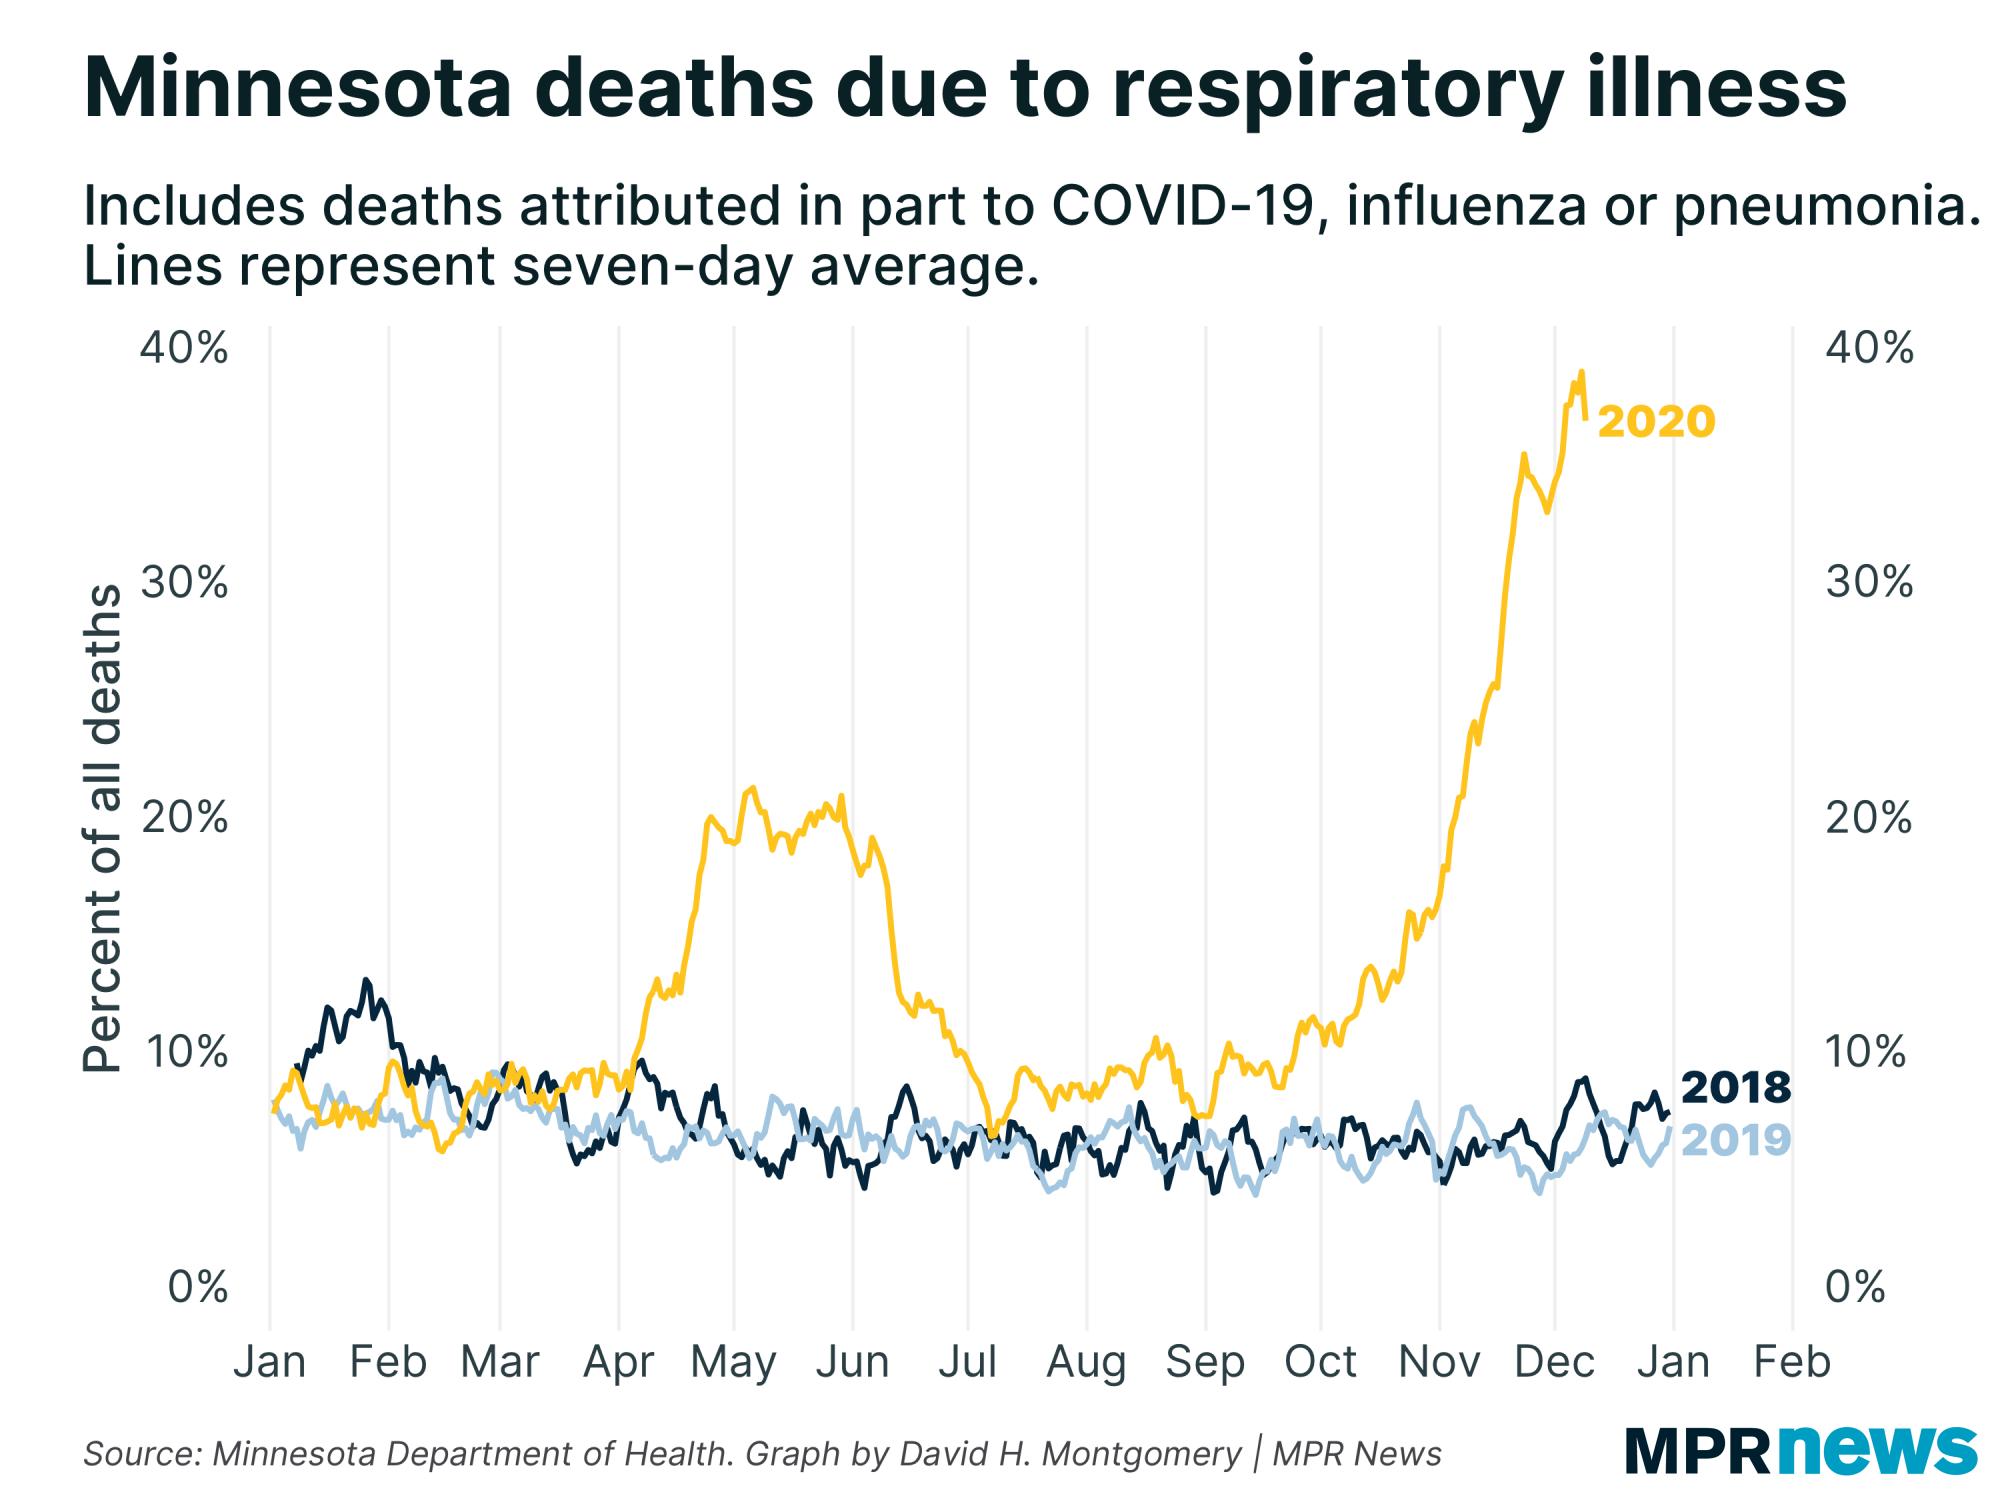 Minnesota deaths due to respiratory illness